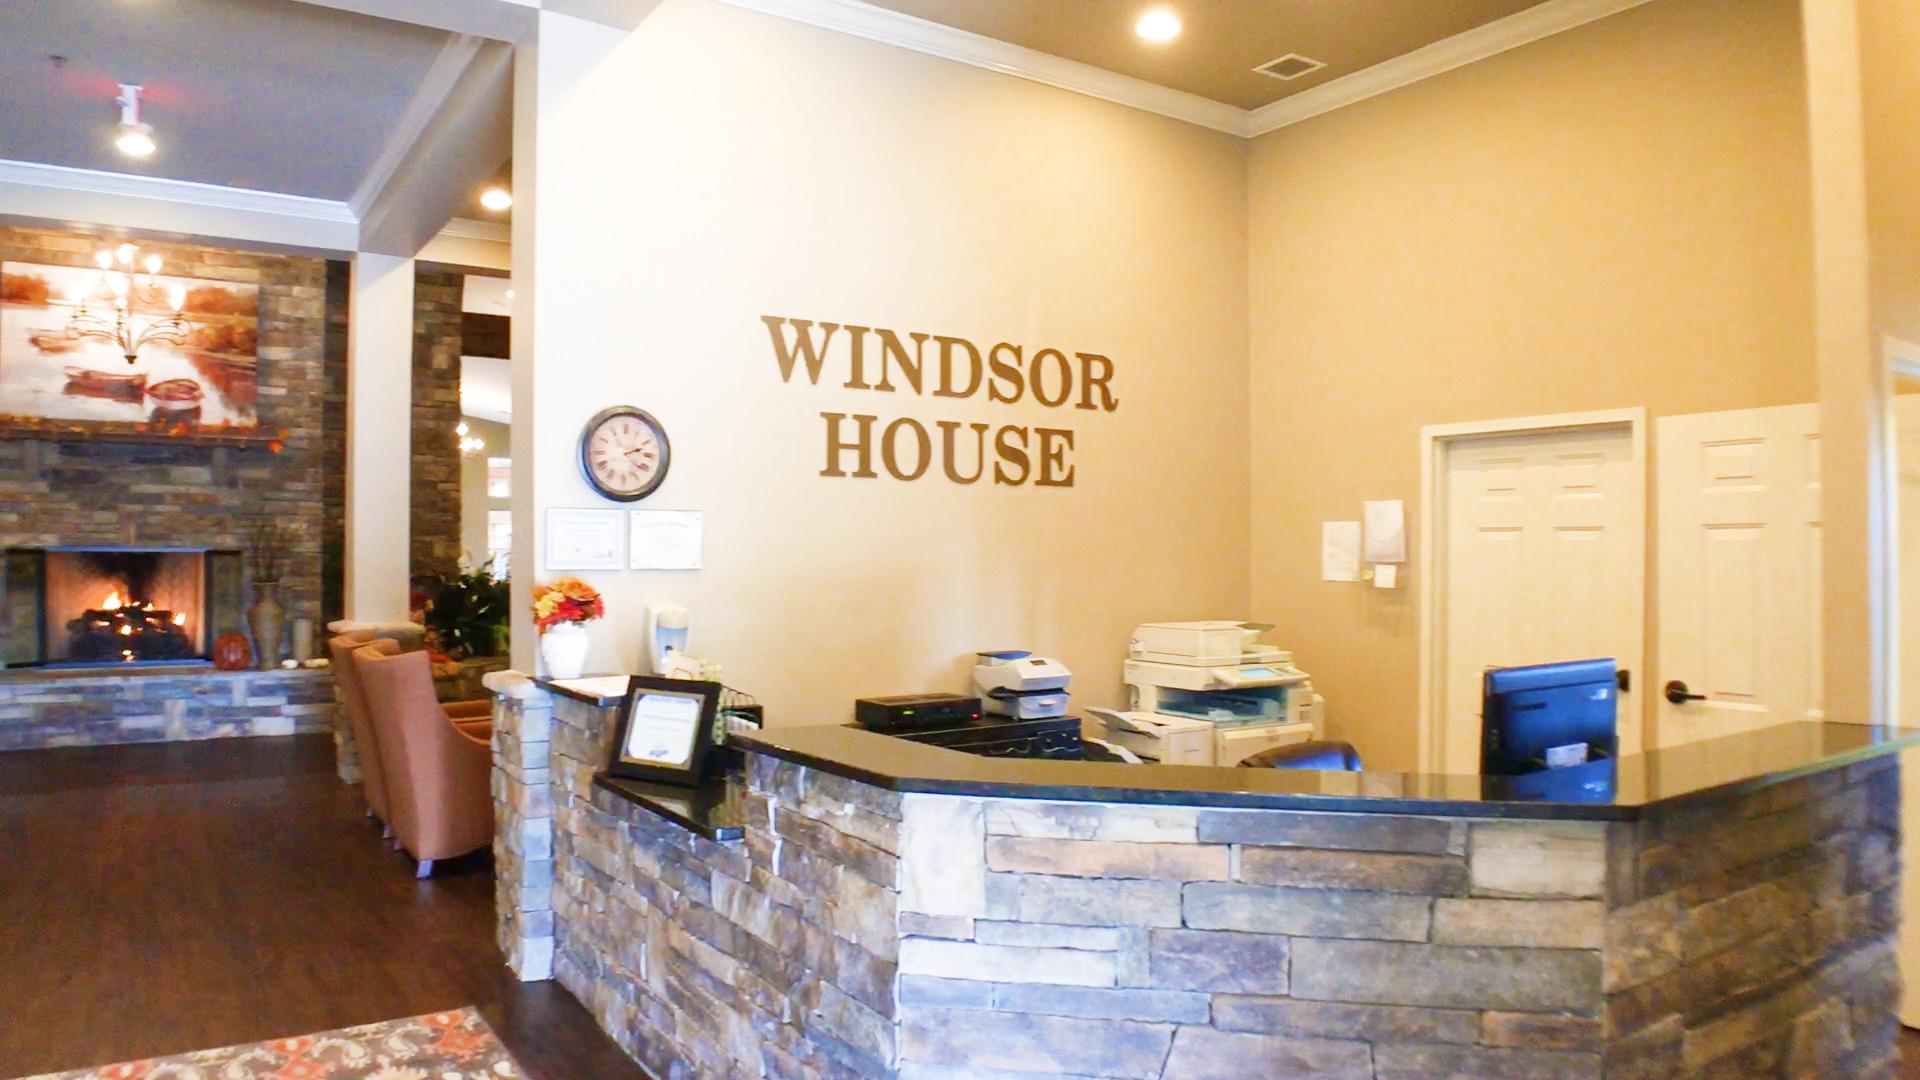 Windsor House Assisted Living image 2